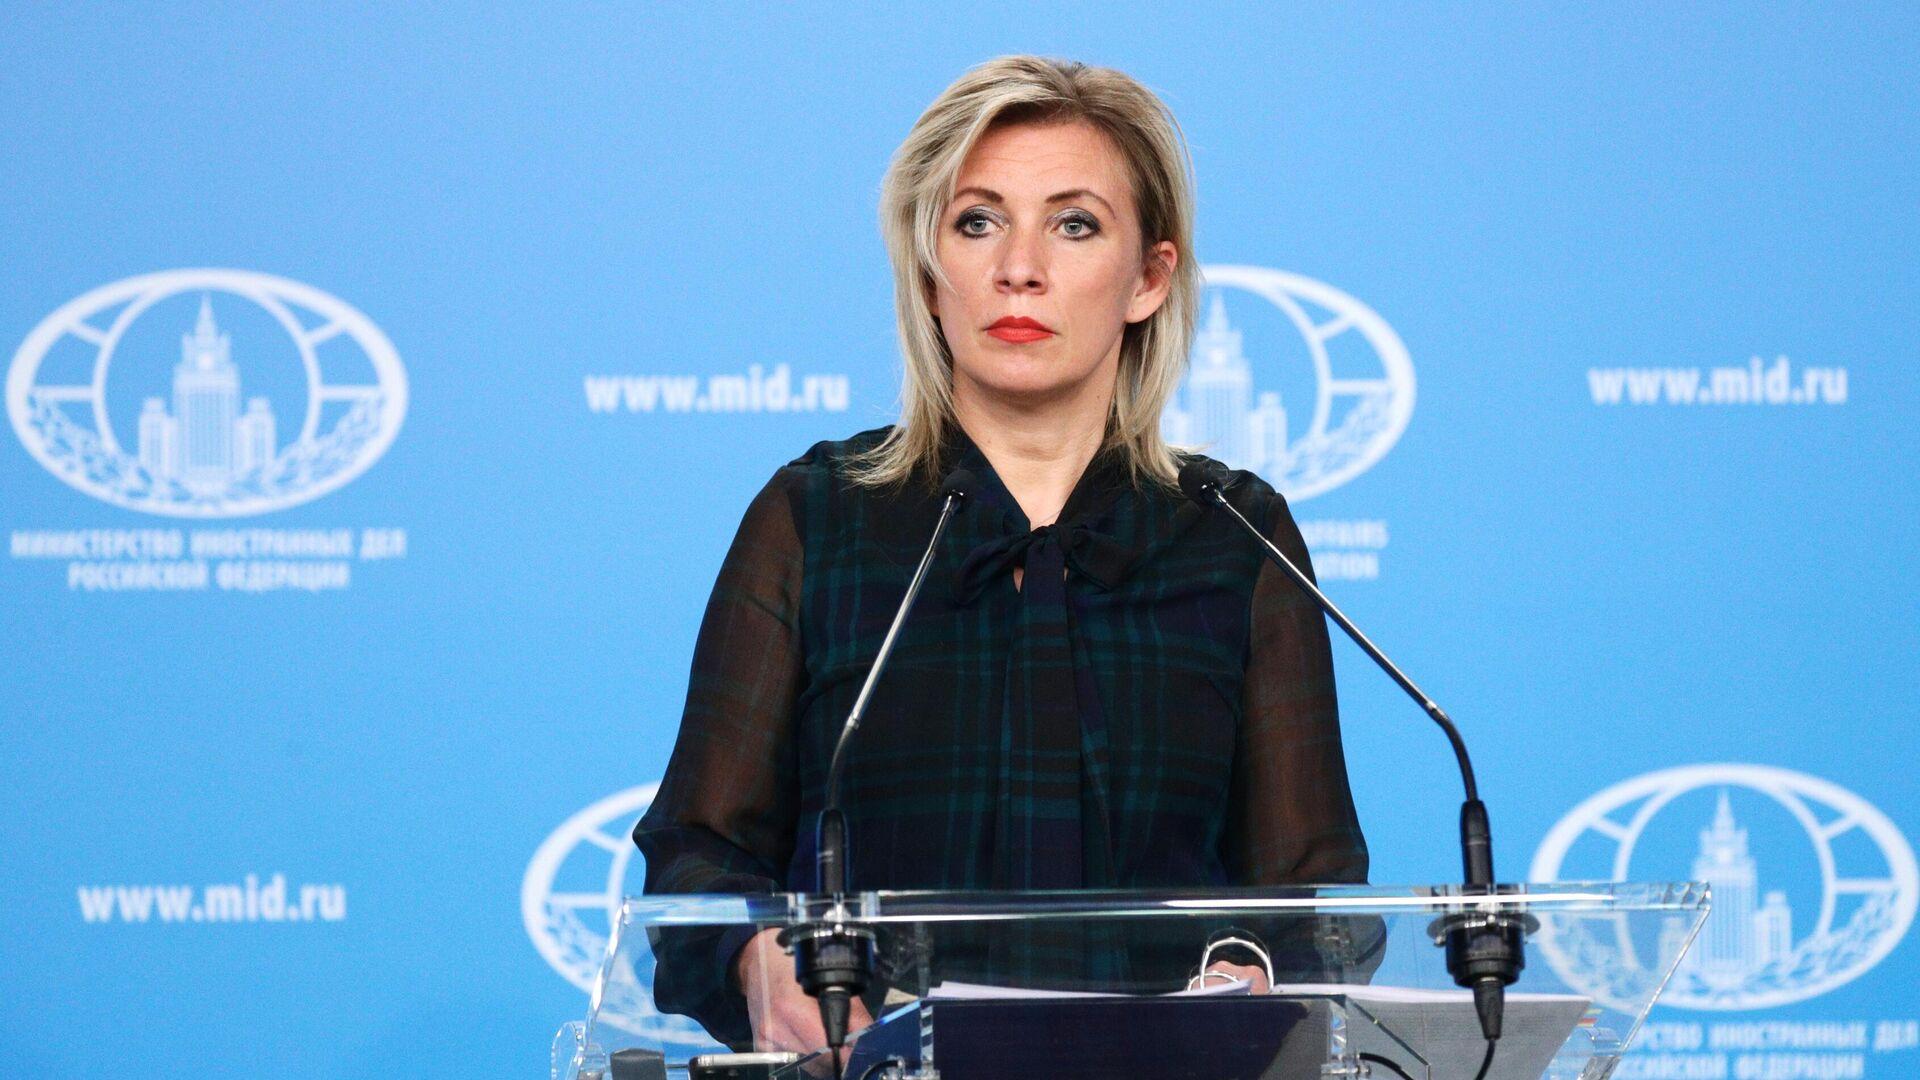 María Zajárova, la portavoz del Ministerio de Exteriores ruso - Sputnik Mundo, 1920, 13.03.2021